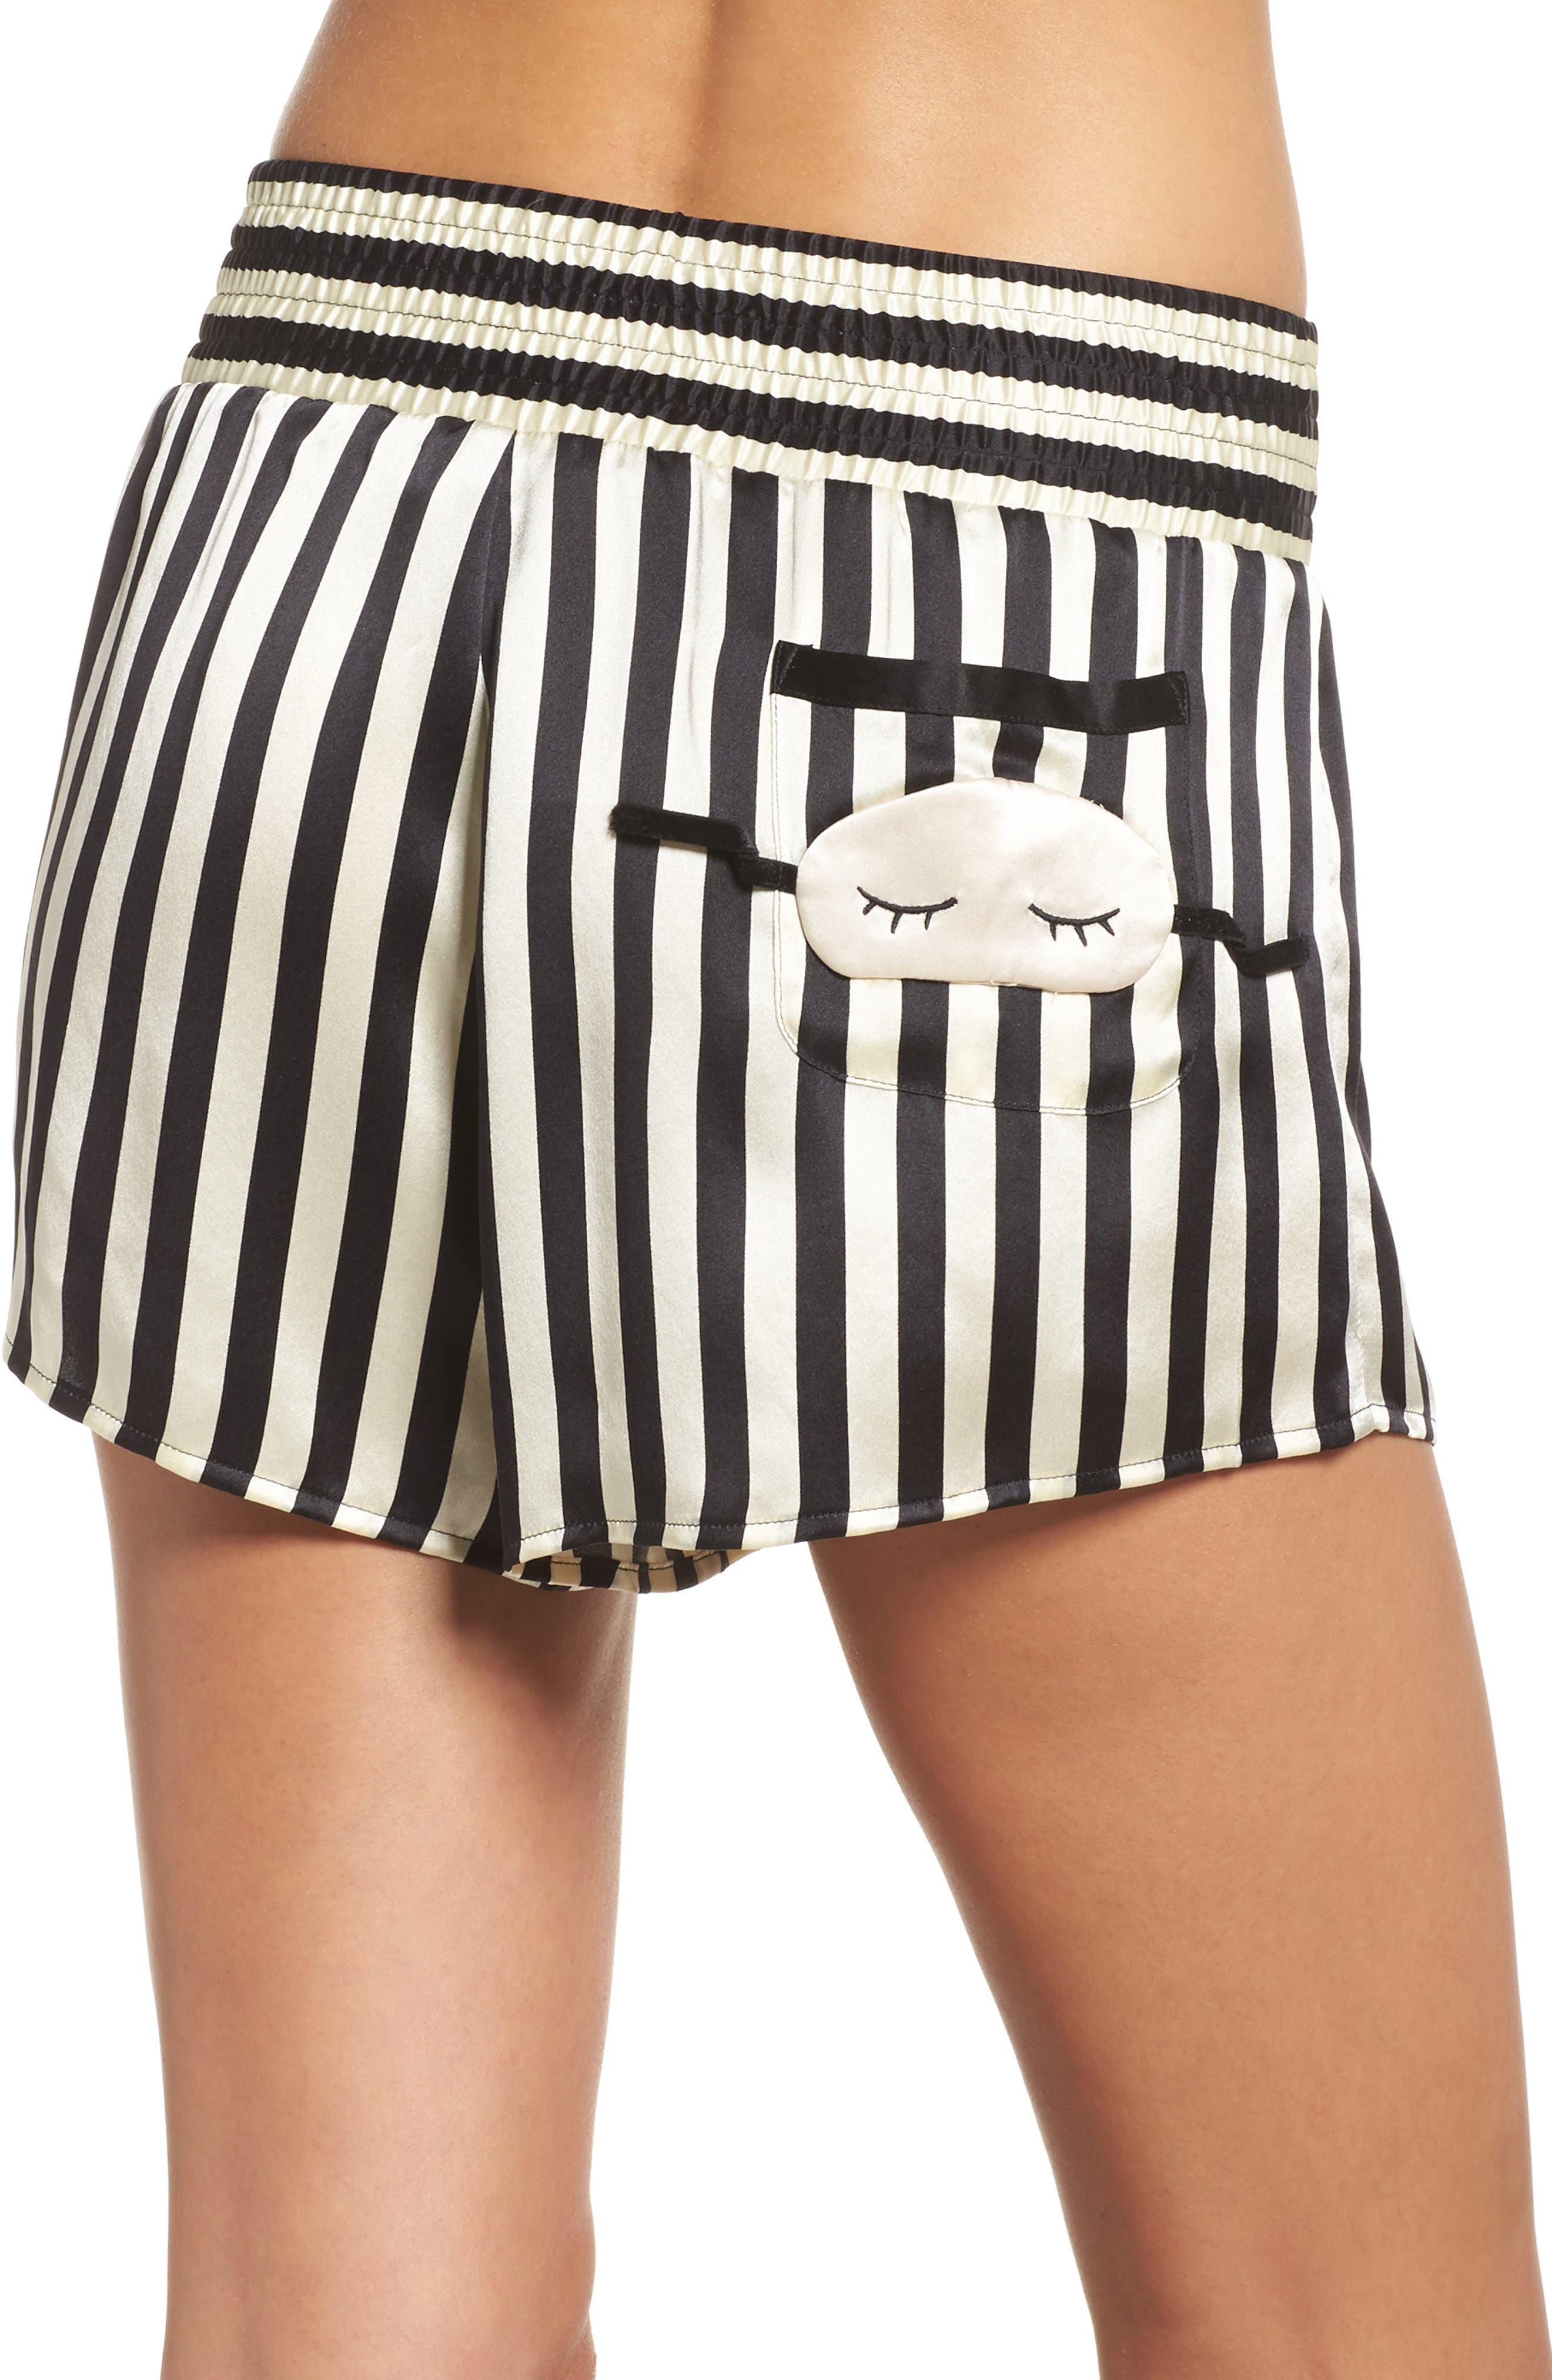 x Amanda Fatherazi Mini Mask Corey Stripe Silk Shorts,                             Alternate thumbnail 2, color,                             Noir/ Ecru